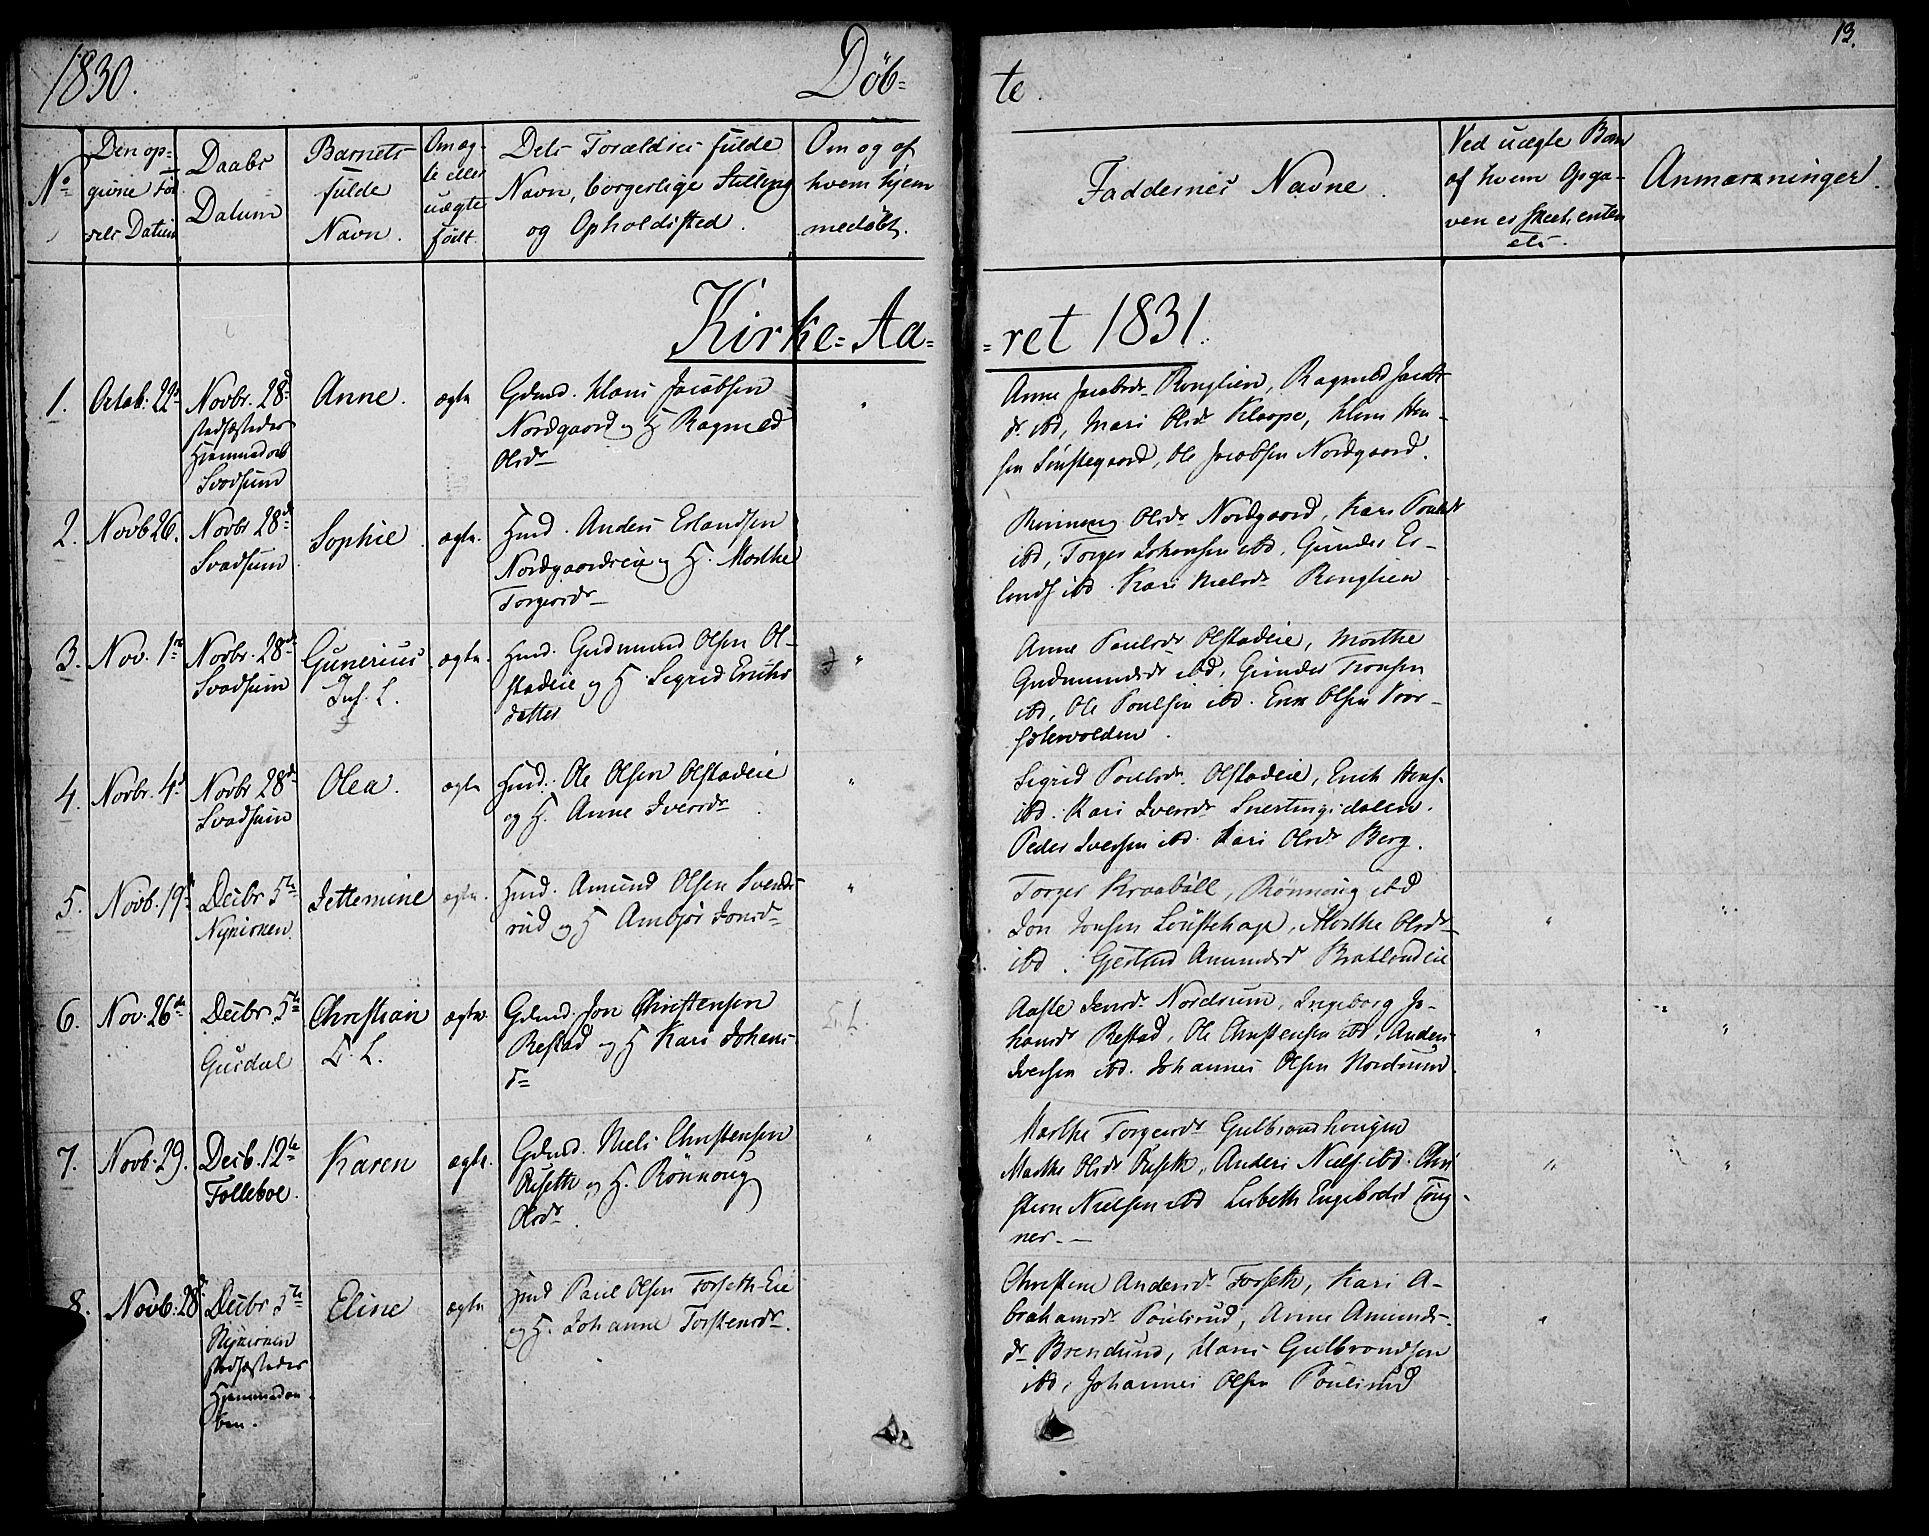 SAH, Gausdal prestekontor, Ministerialbok nr. 6, 1830-1839, s. 13